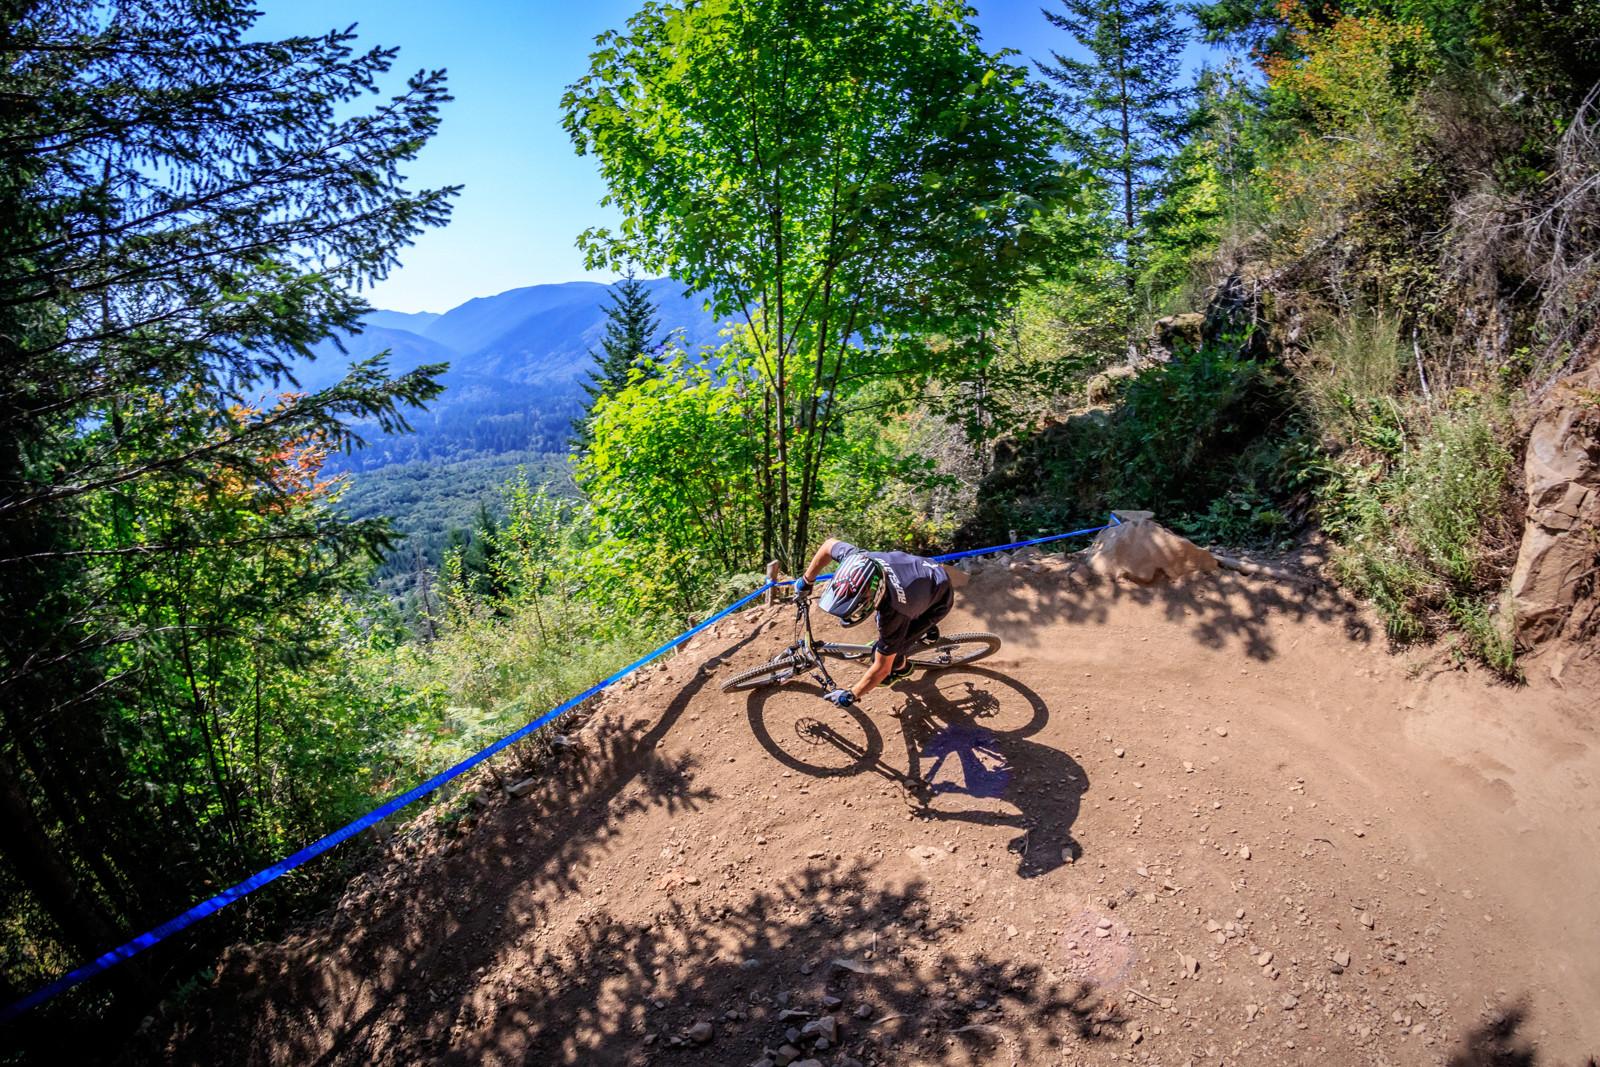 Mitch Ropelato - 2015 Oregon Enduro Series Finals Mt. Hood - Mountain Biking Pictures - Vital MTB